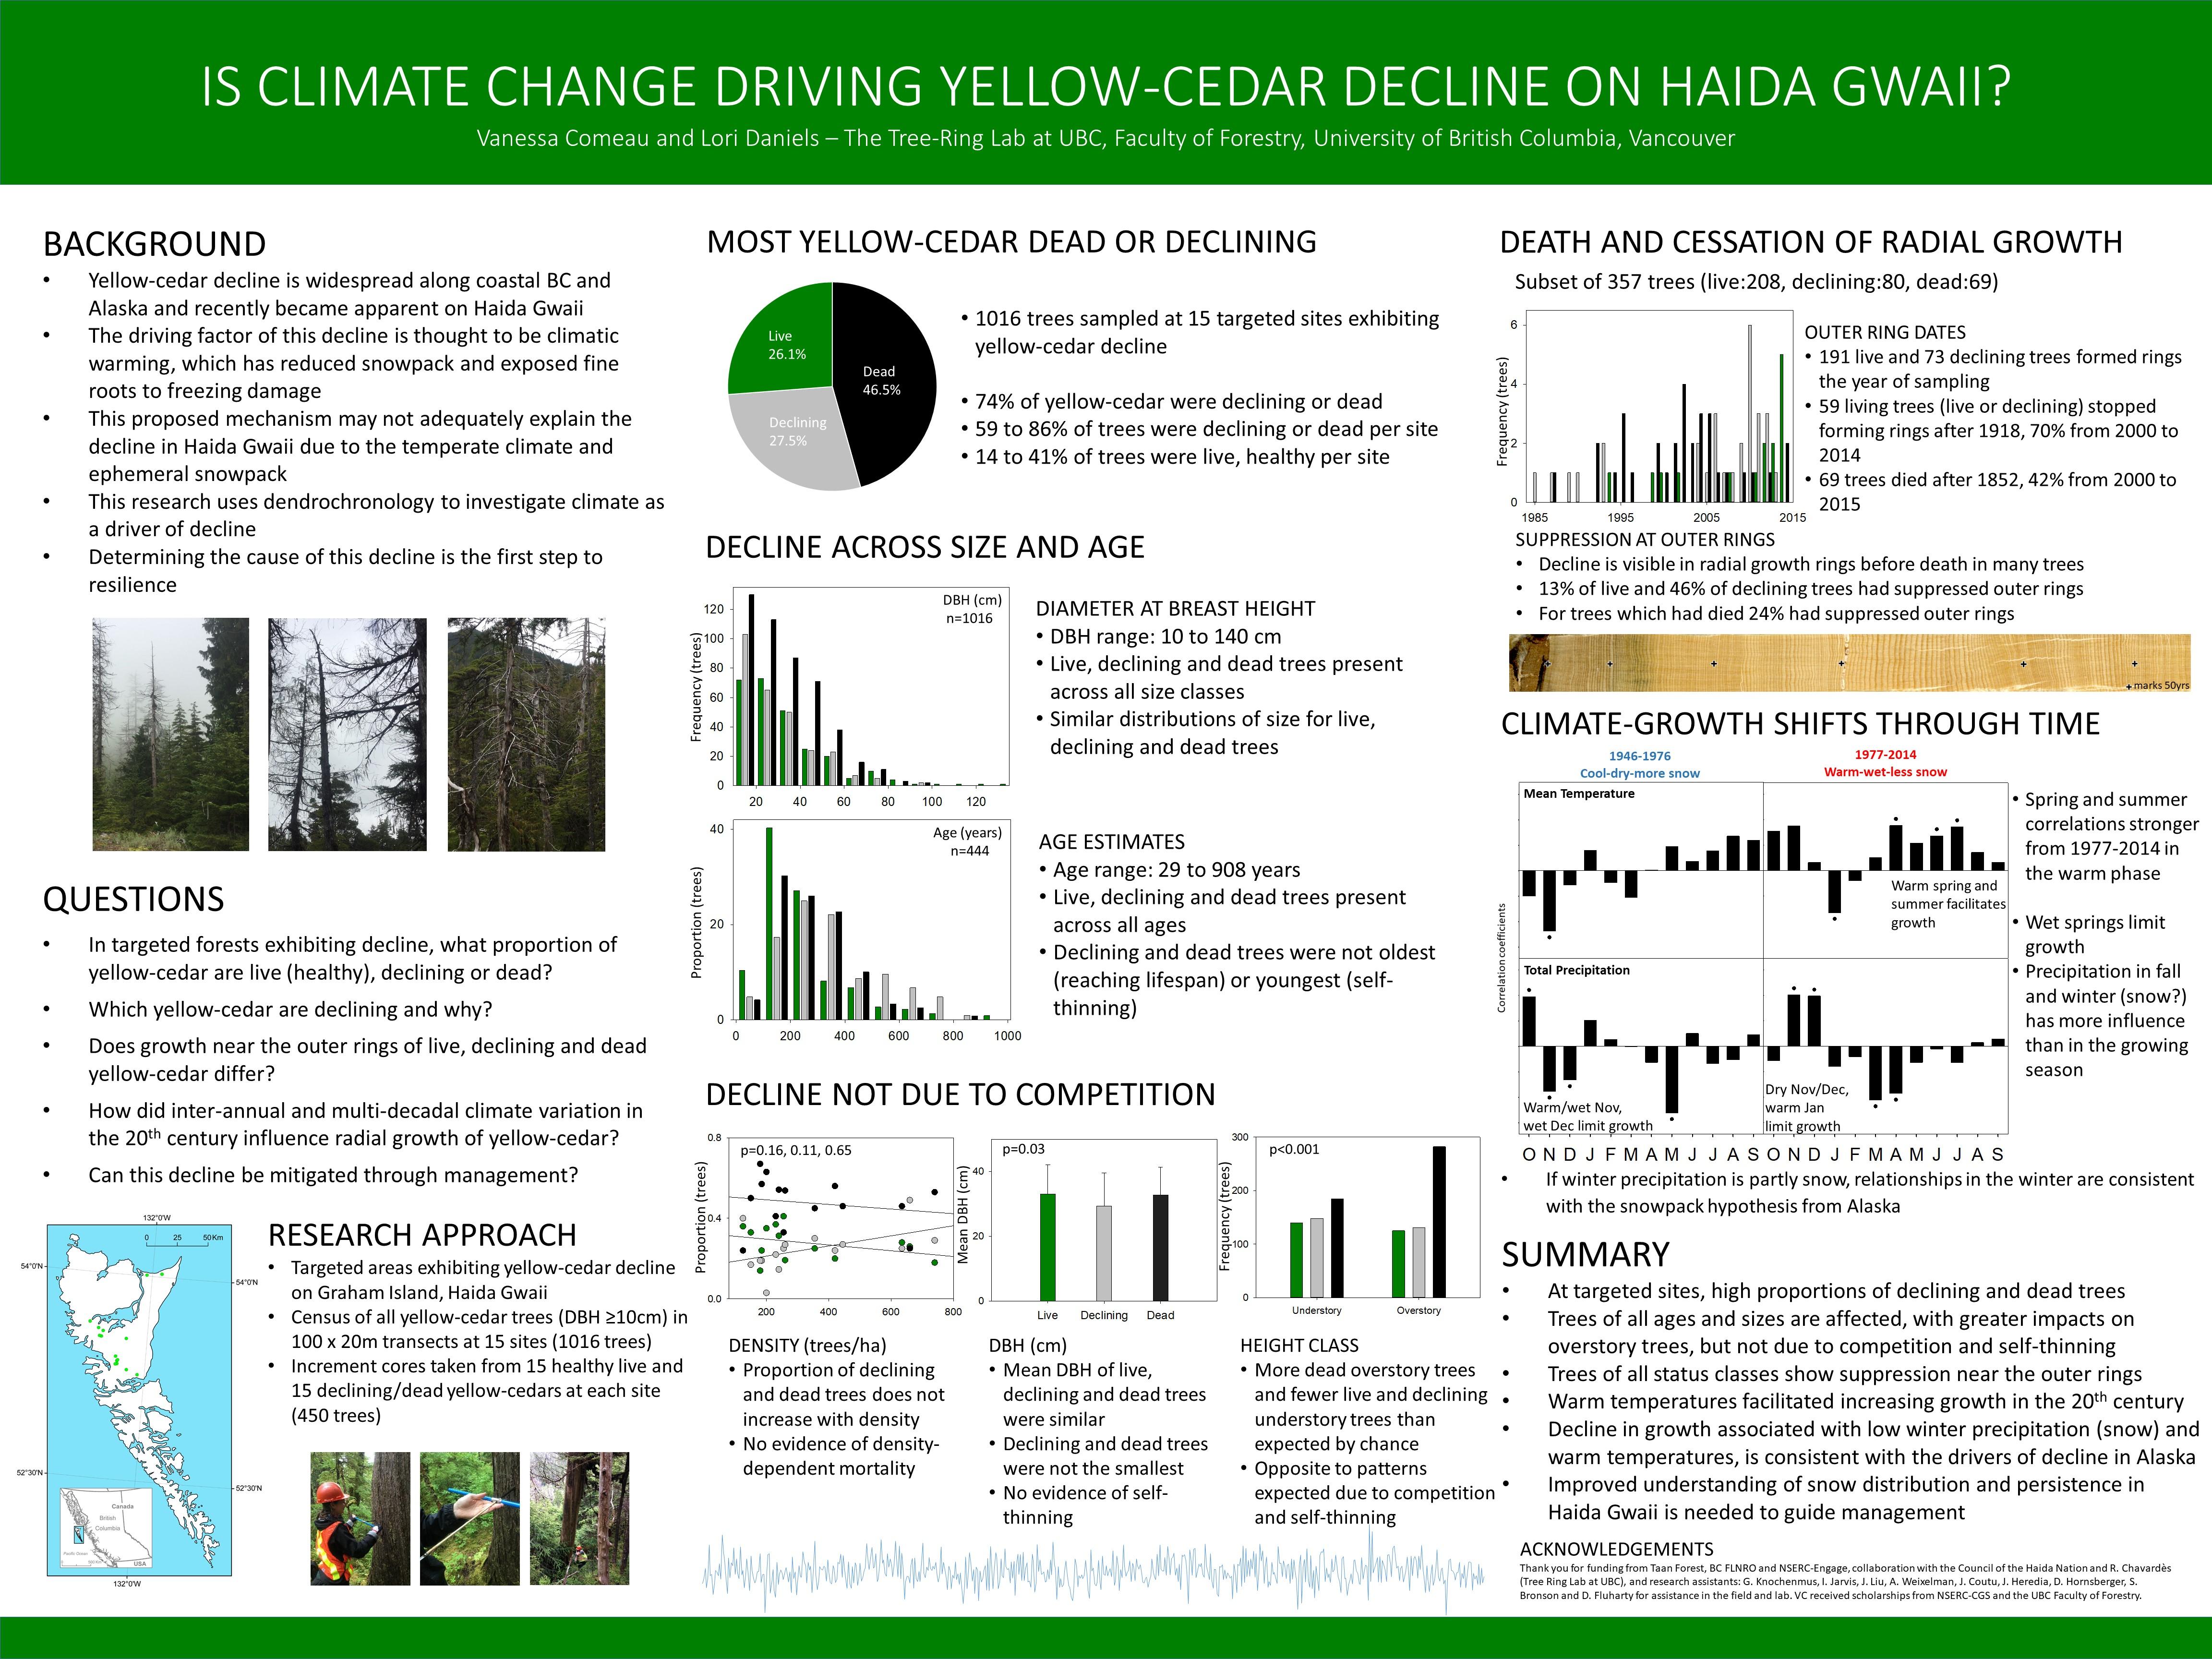 Is Climate Change driving Yellow-Cedar decline on Haida Gwaii